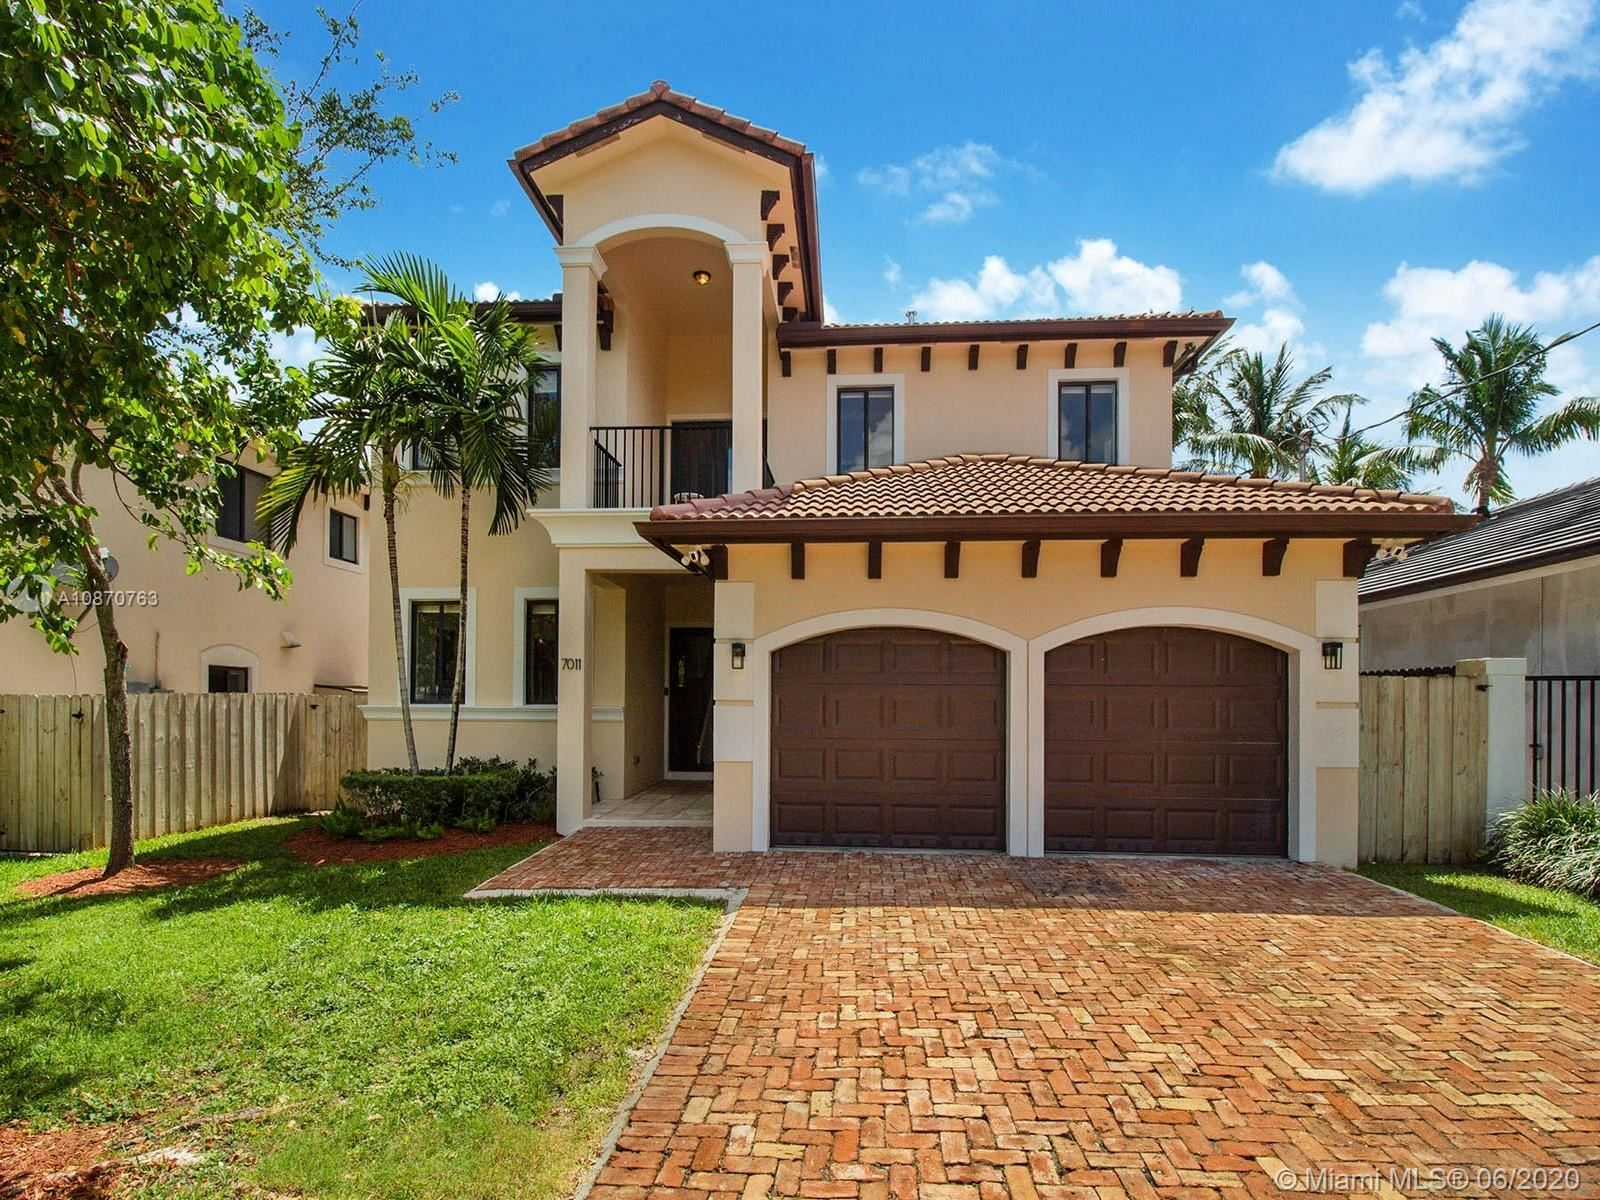 7011 SW 83 Place, Miami, FL 33143 - #: A10870763